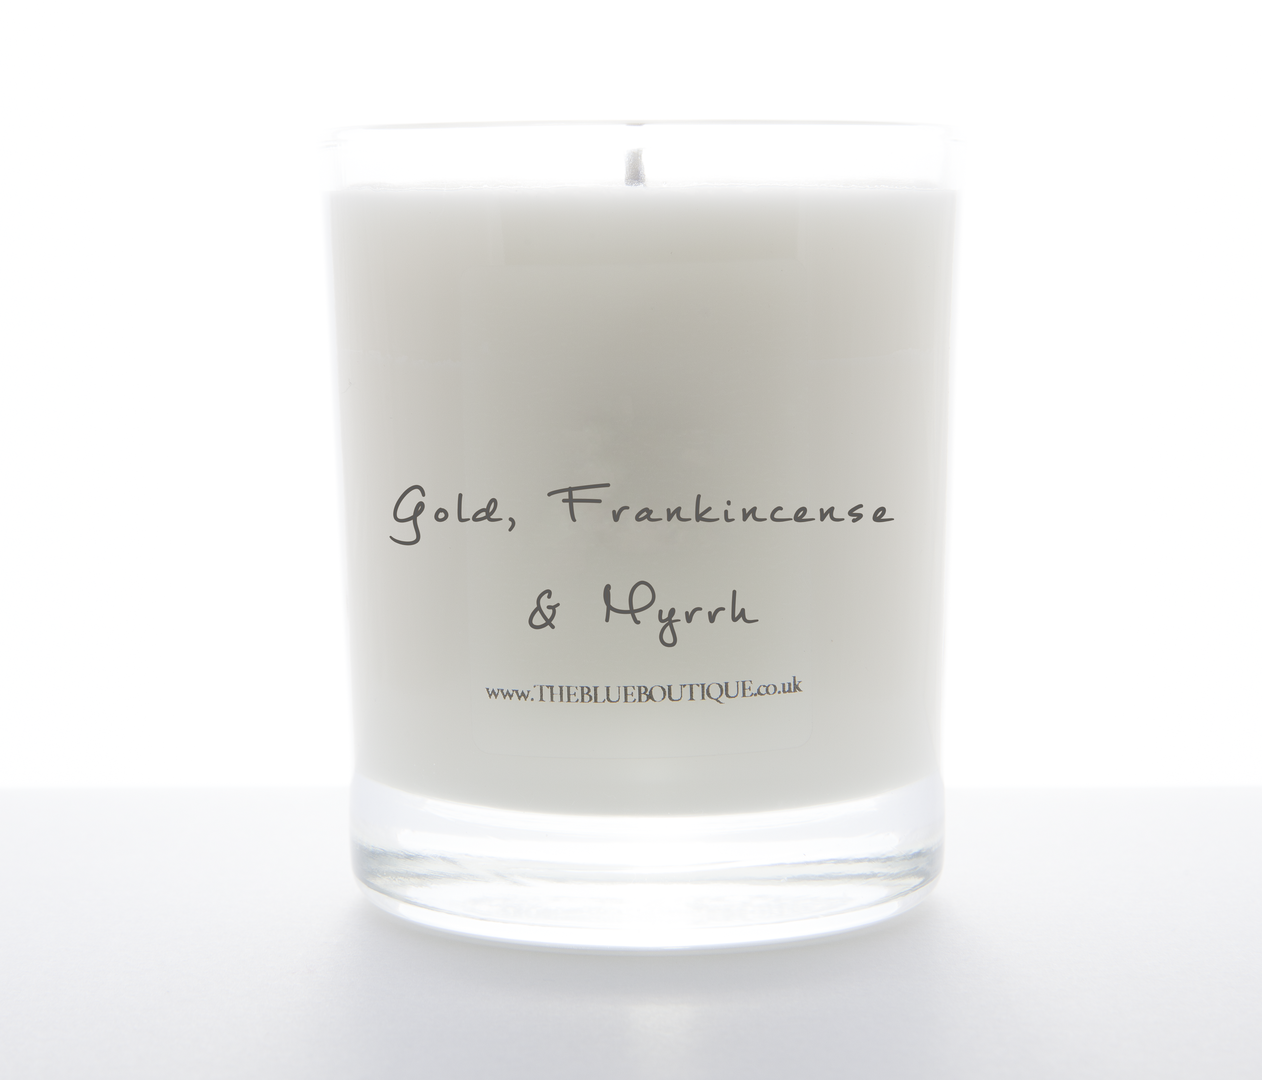 Gold Frankincense And Myrrh Candles